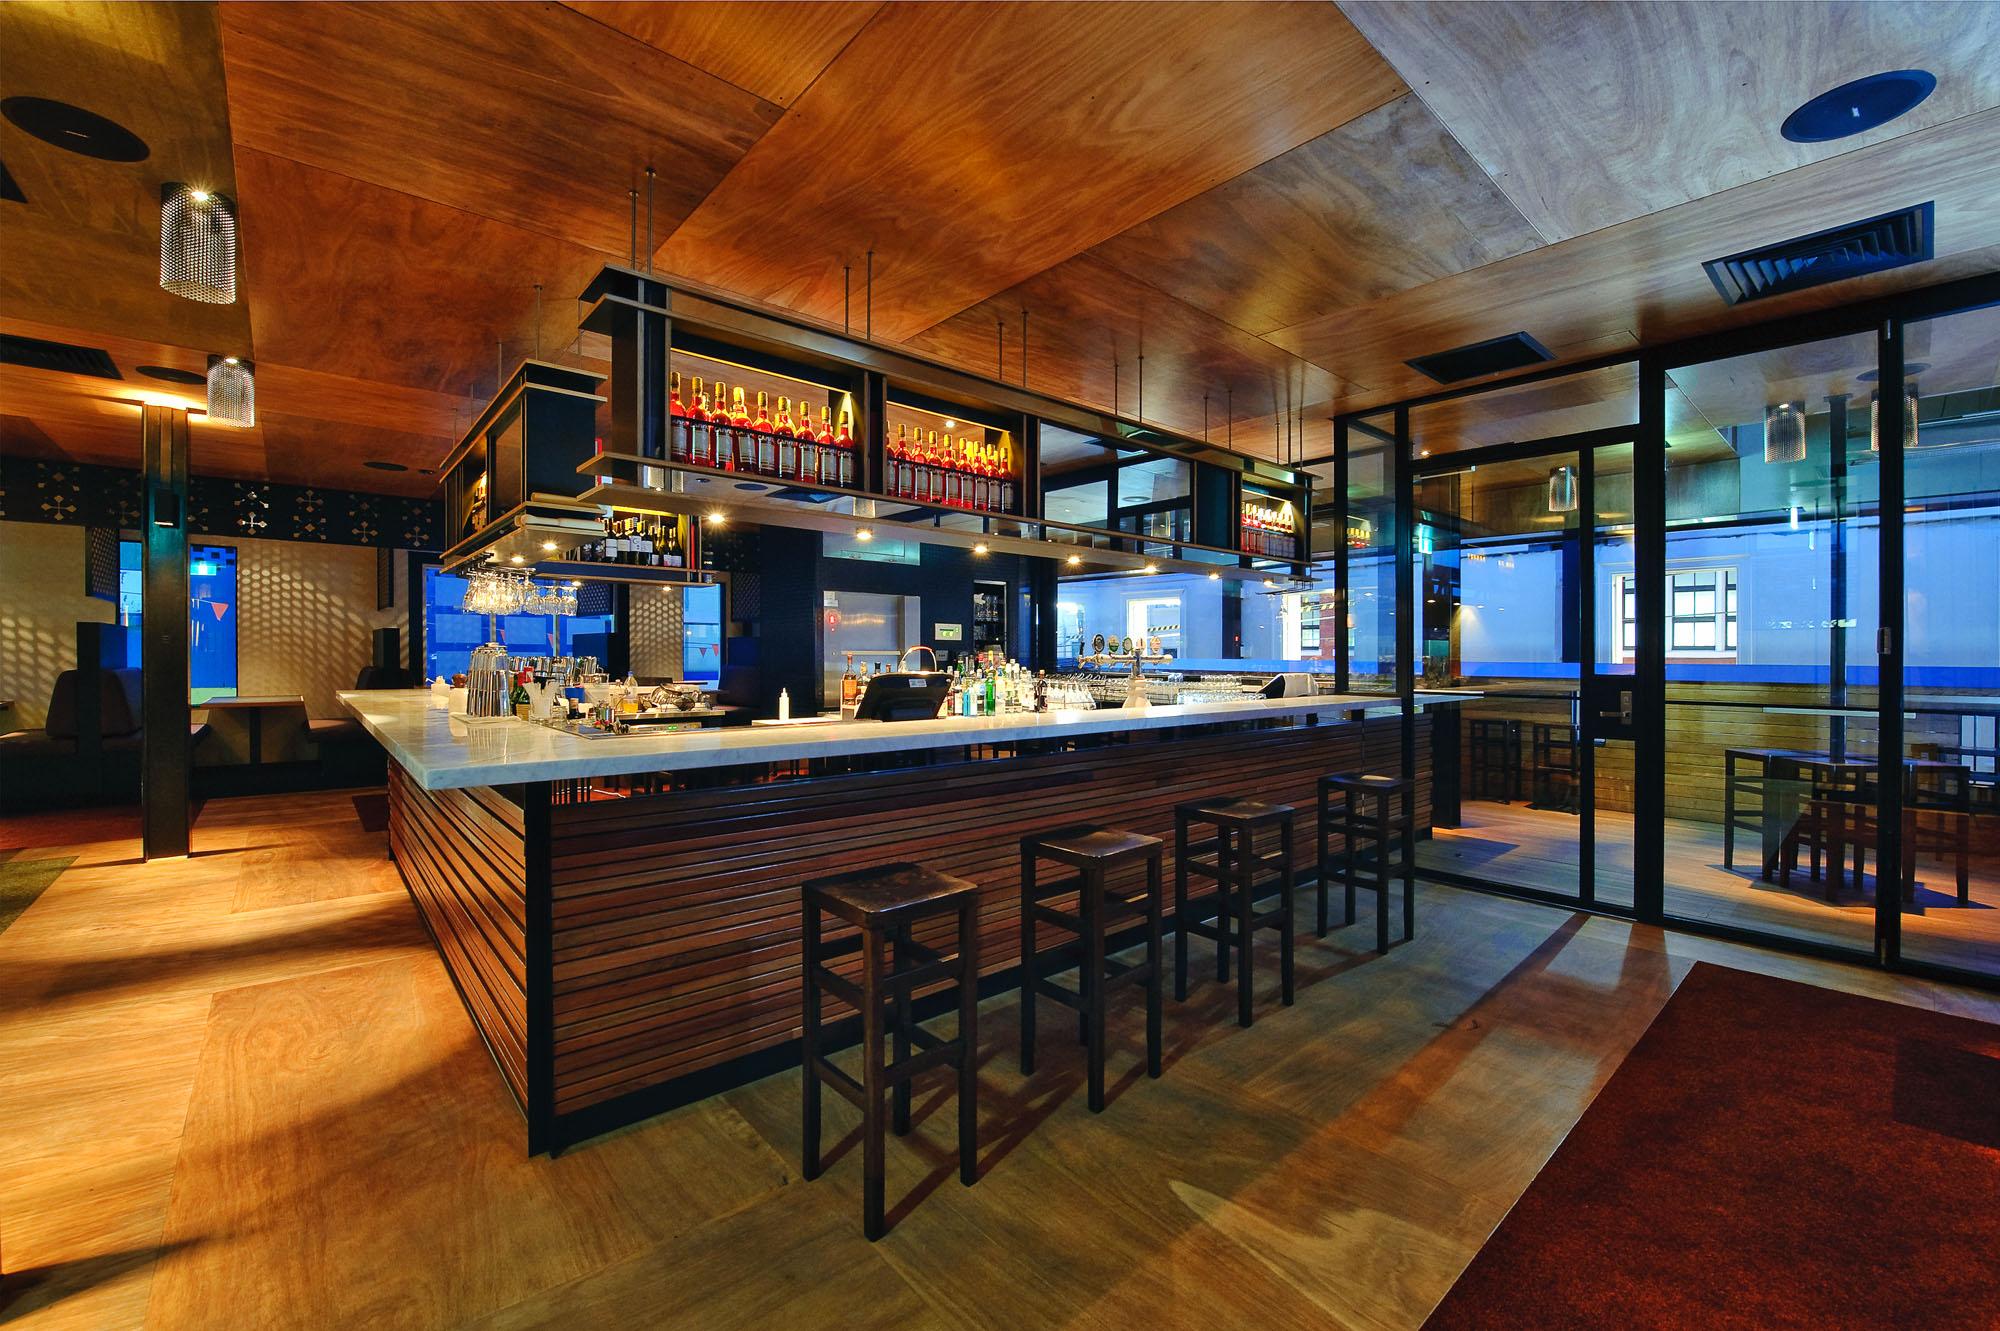 Saxon Hotel-01-PRodriguez_LRWeb.jpg